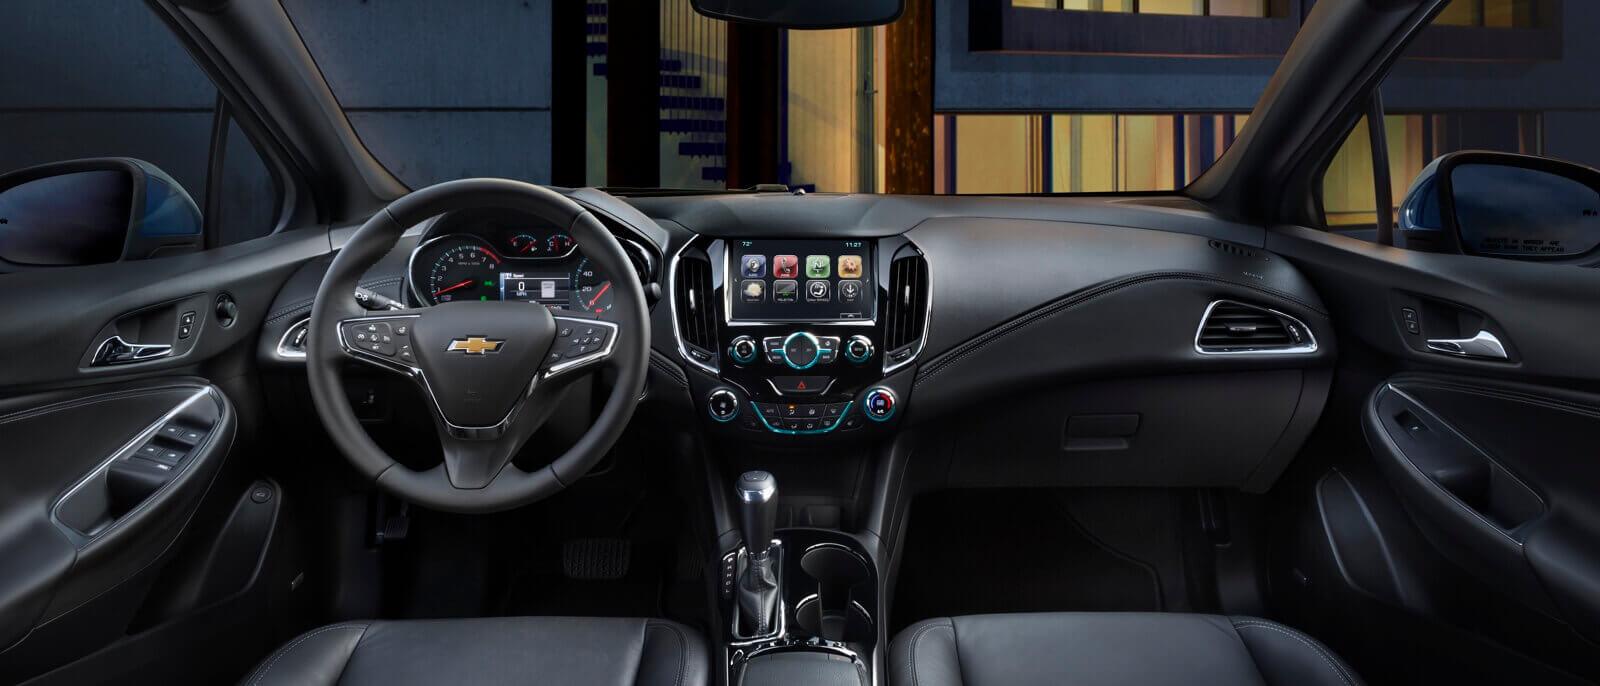 2017 Chevrolet Cruze Hatchback front interior